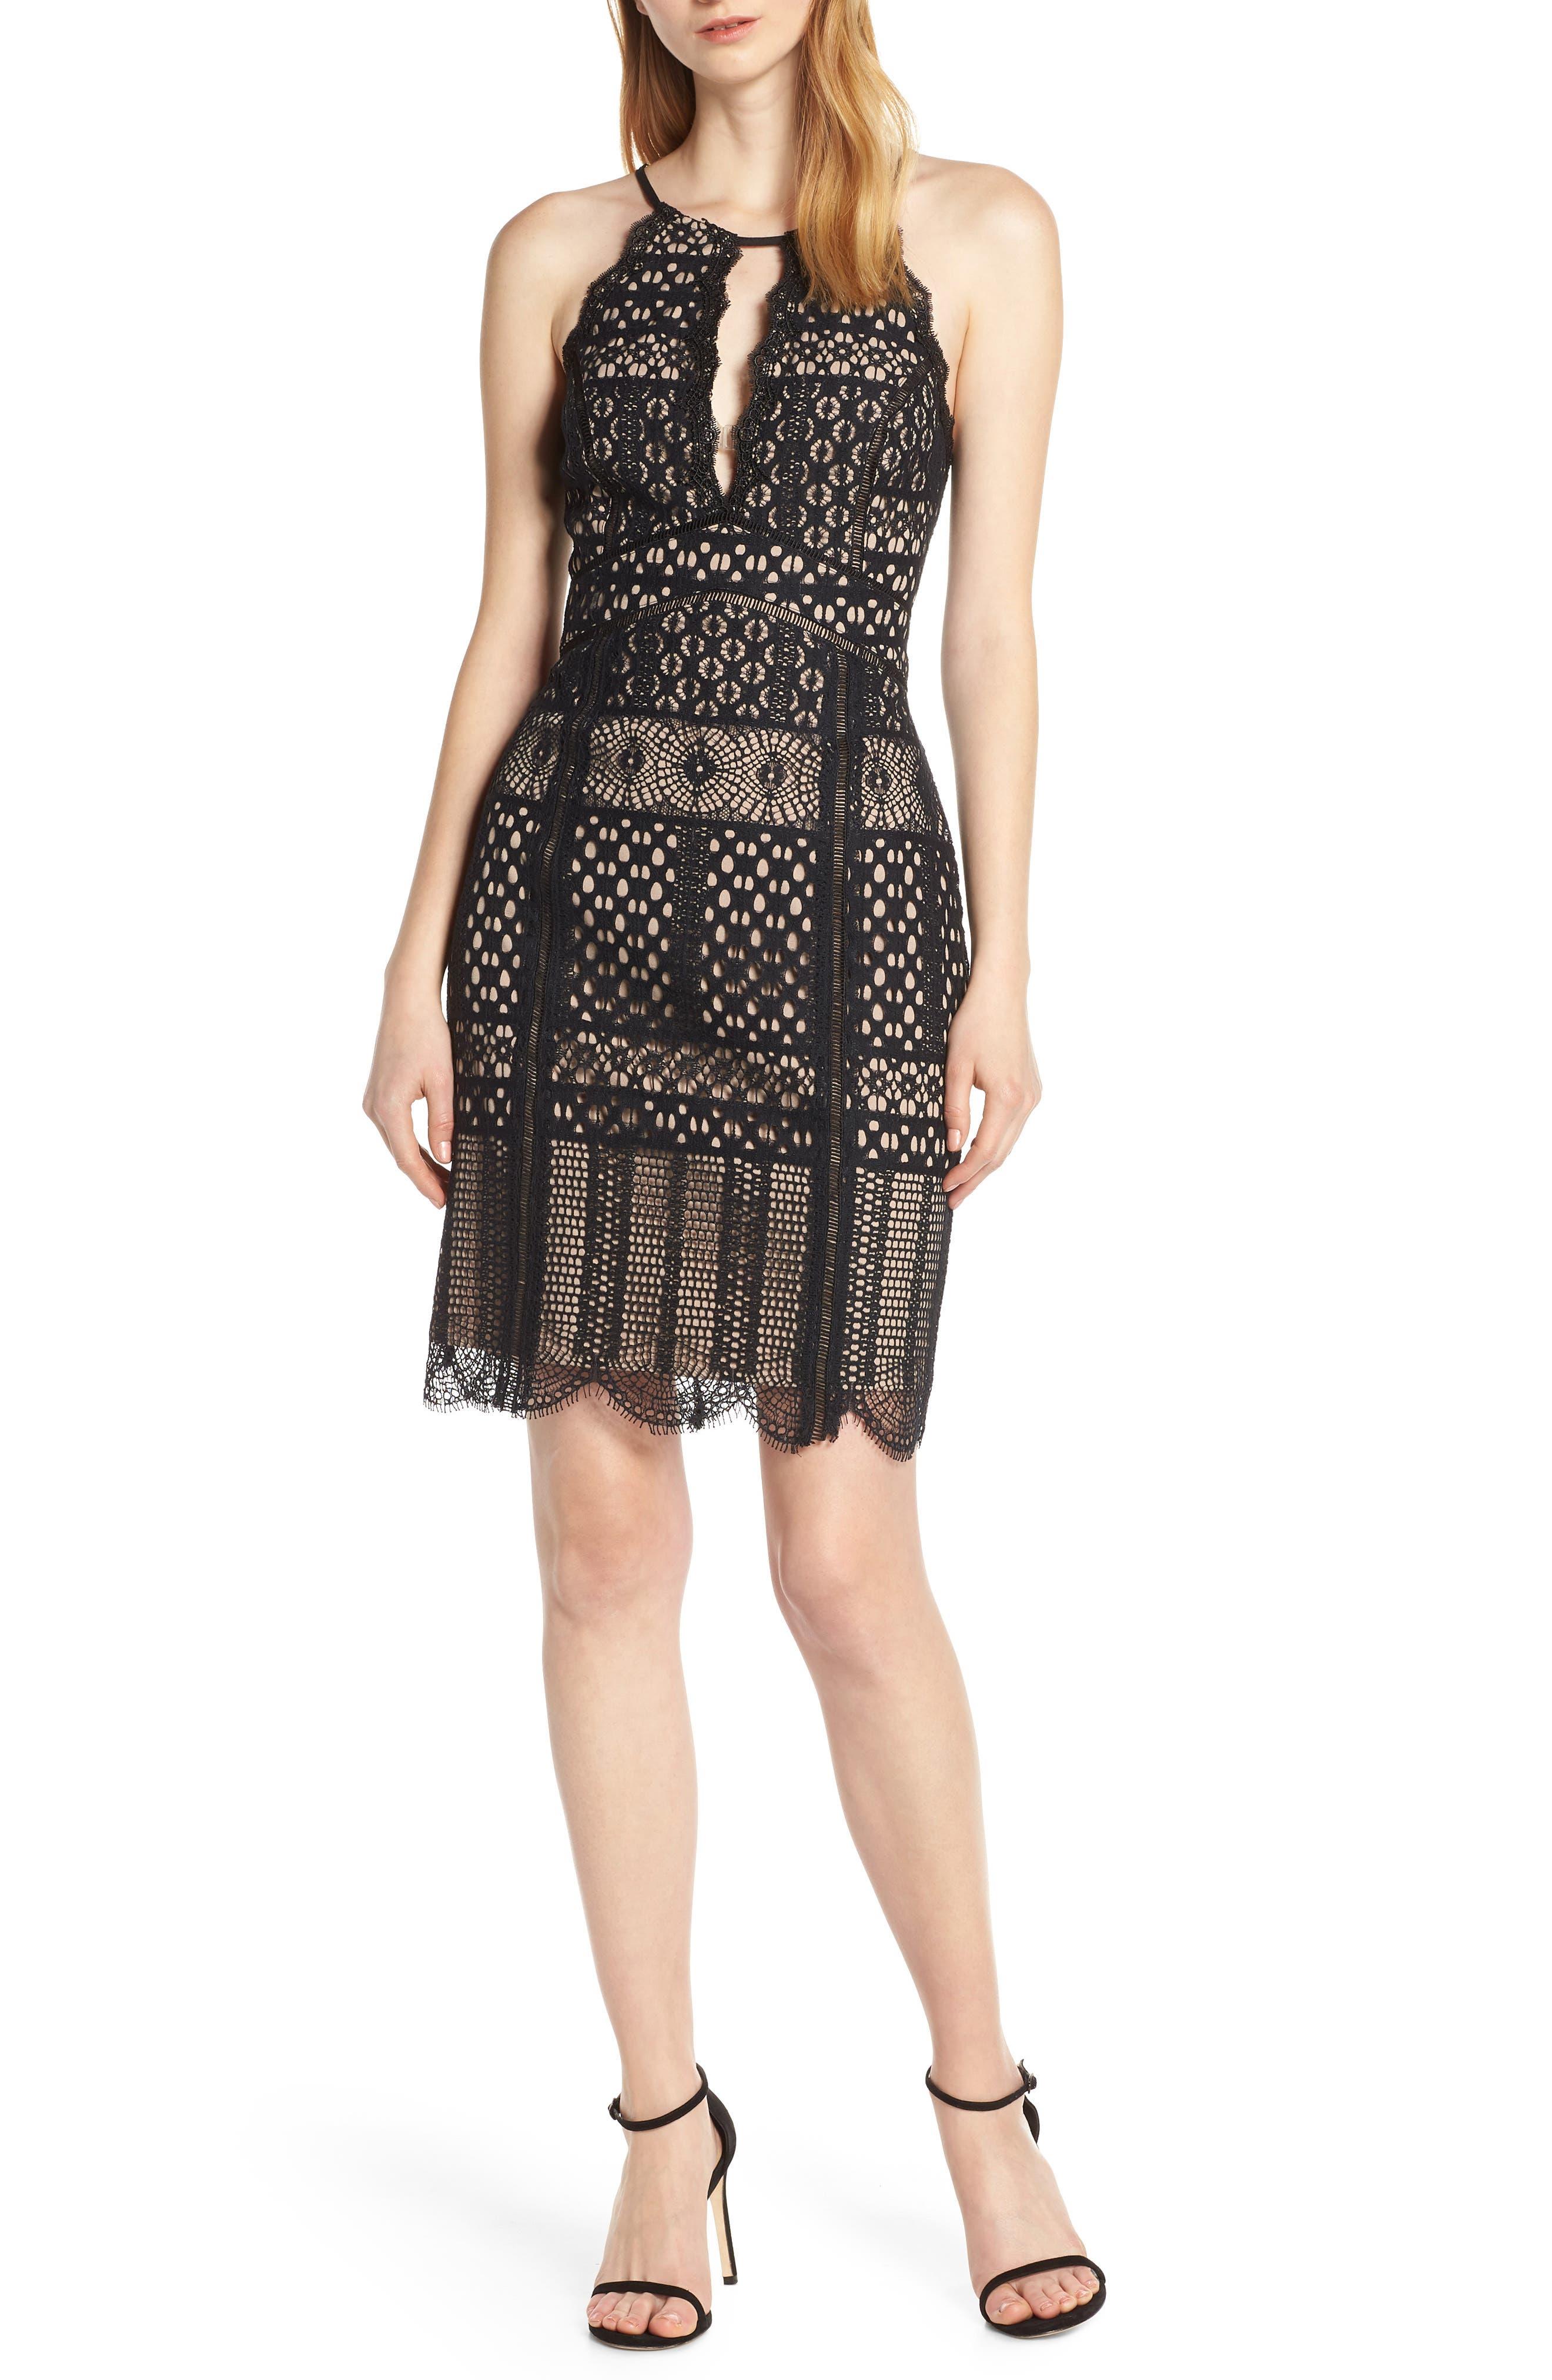 Harlyn Halter Neck Lace Cocktail Dress, Black